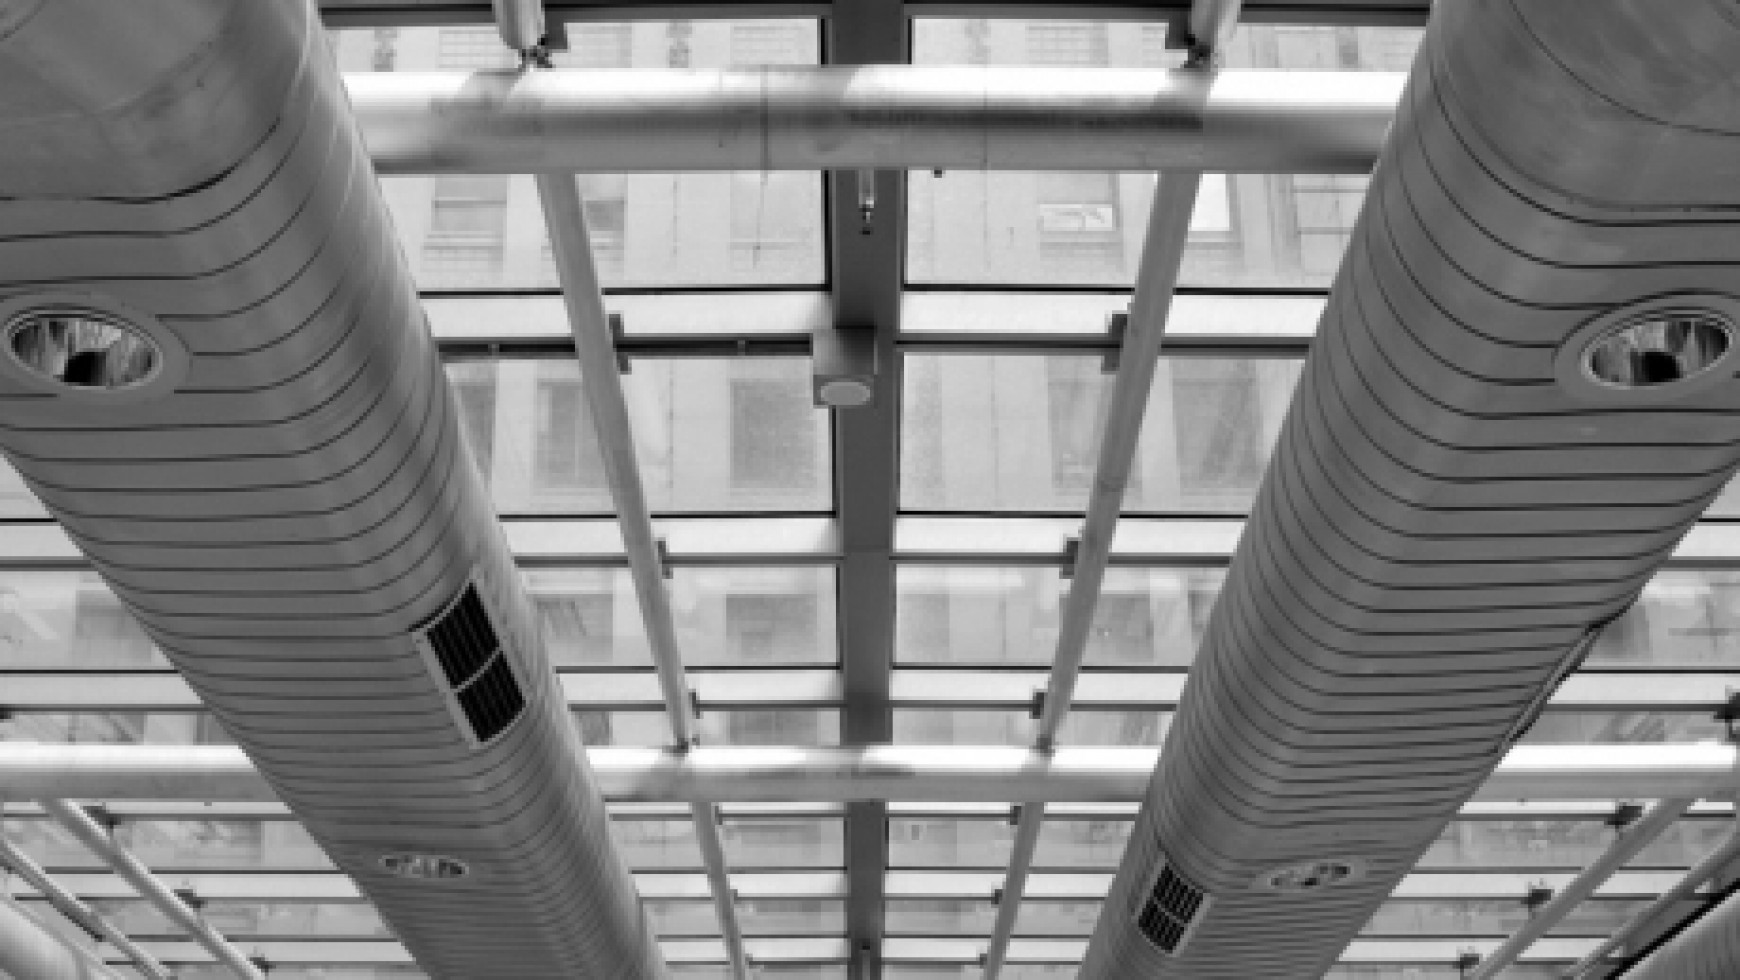 Bonifica antibatterica permanente di impianti di areazione